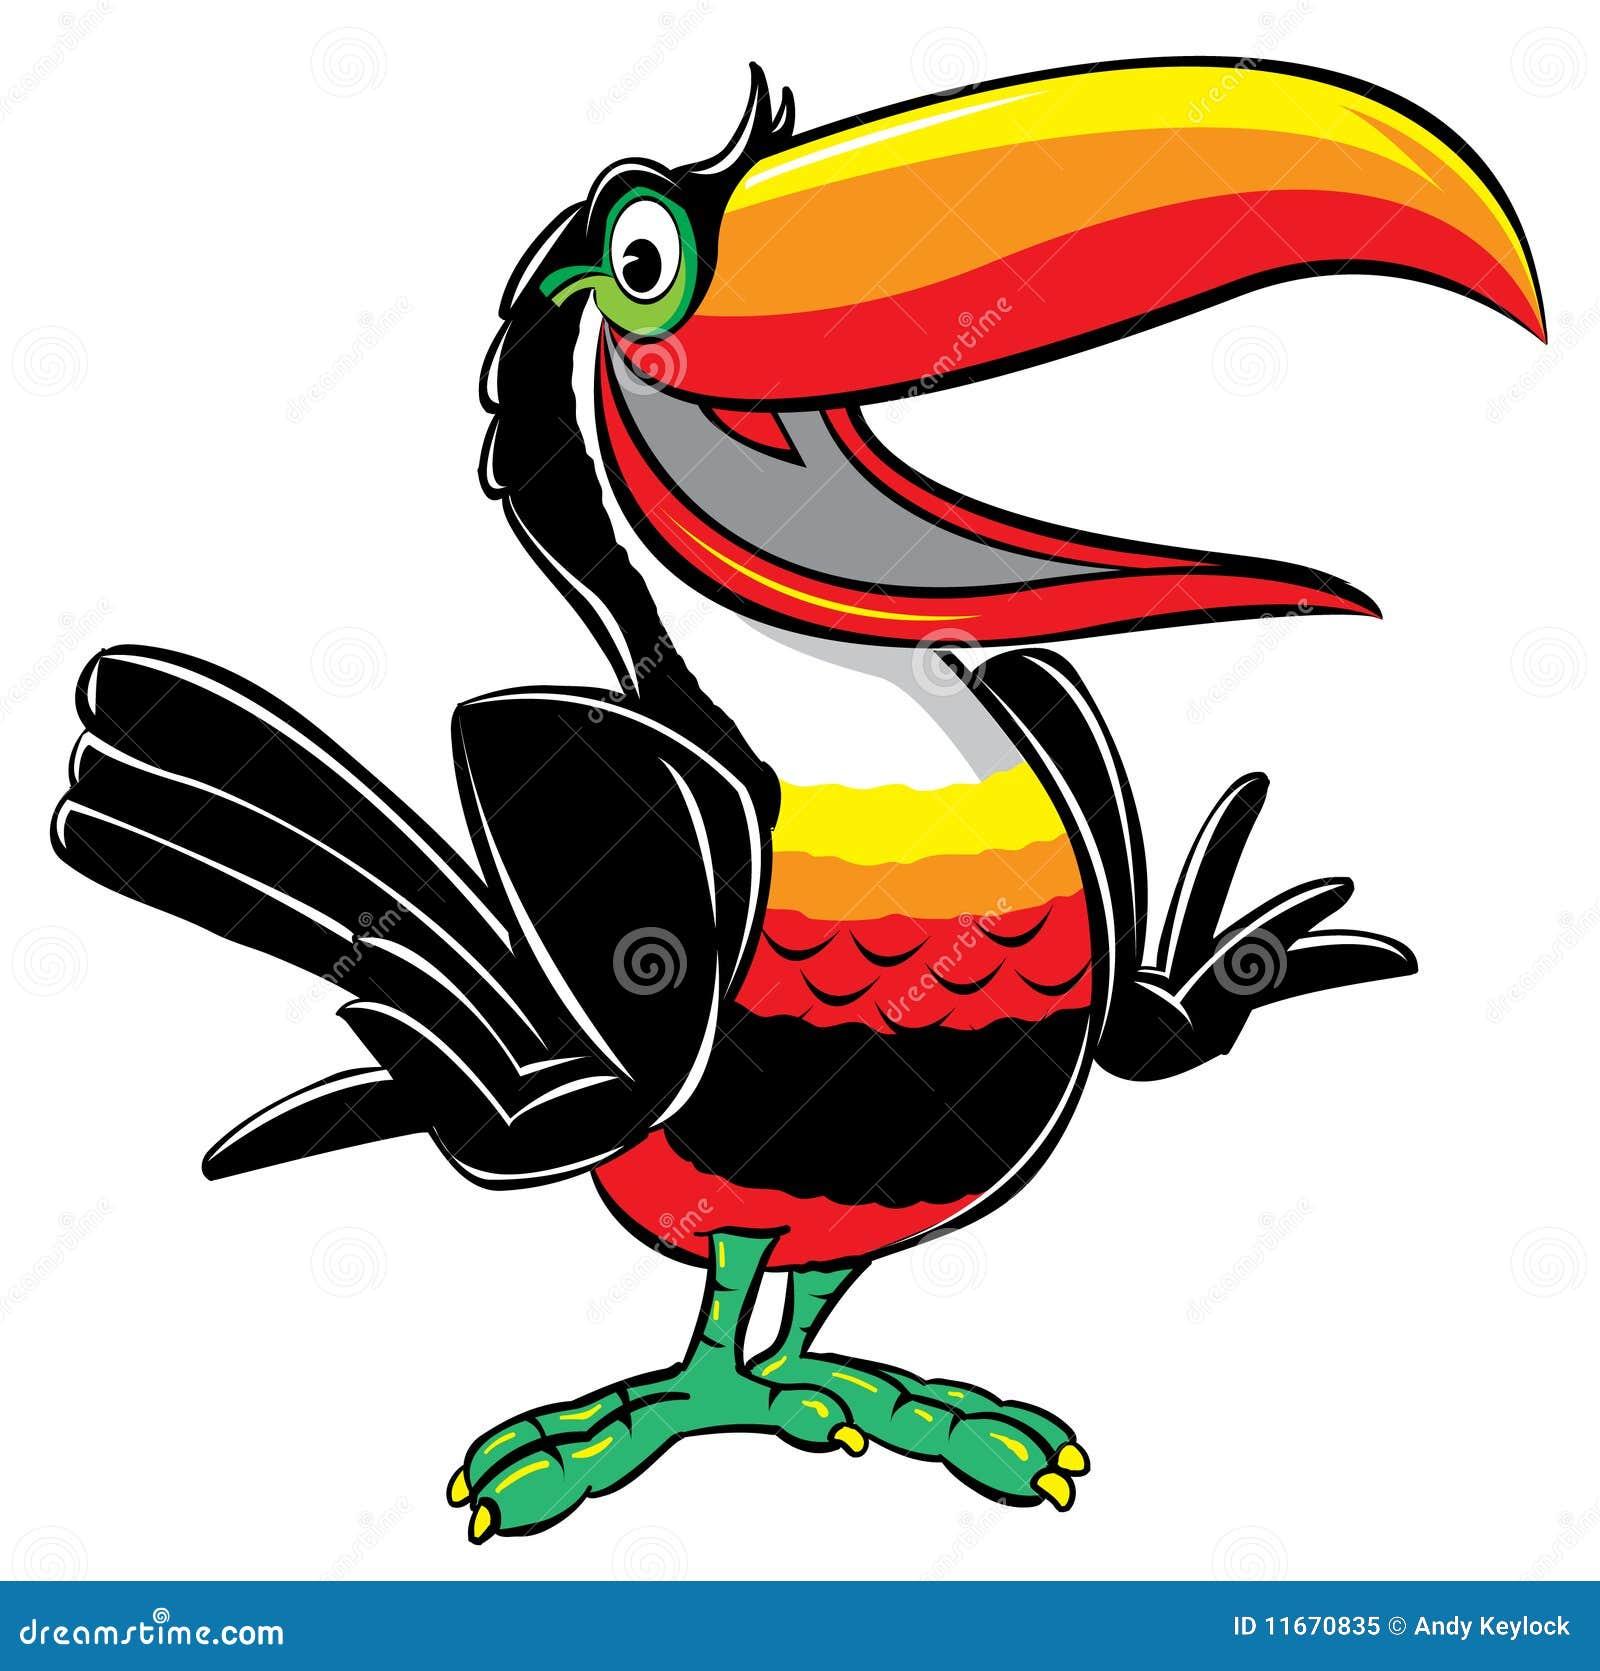 Toucan Cartoon Illustration Royalty Free Stock Photo - Image: 11670835